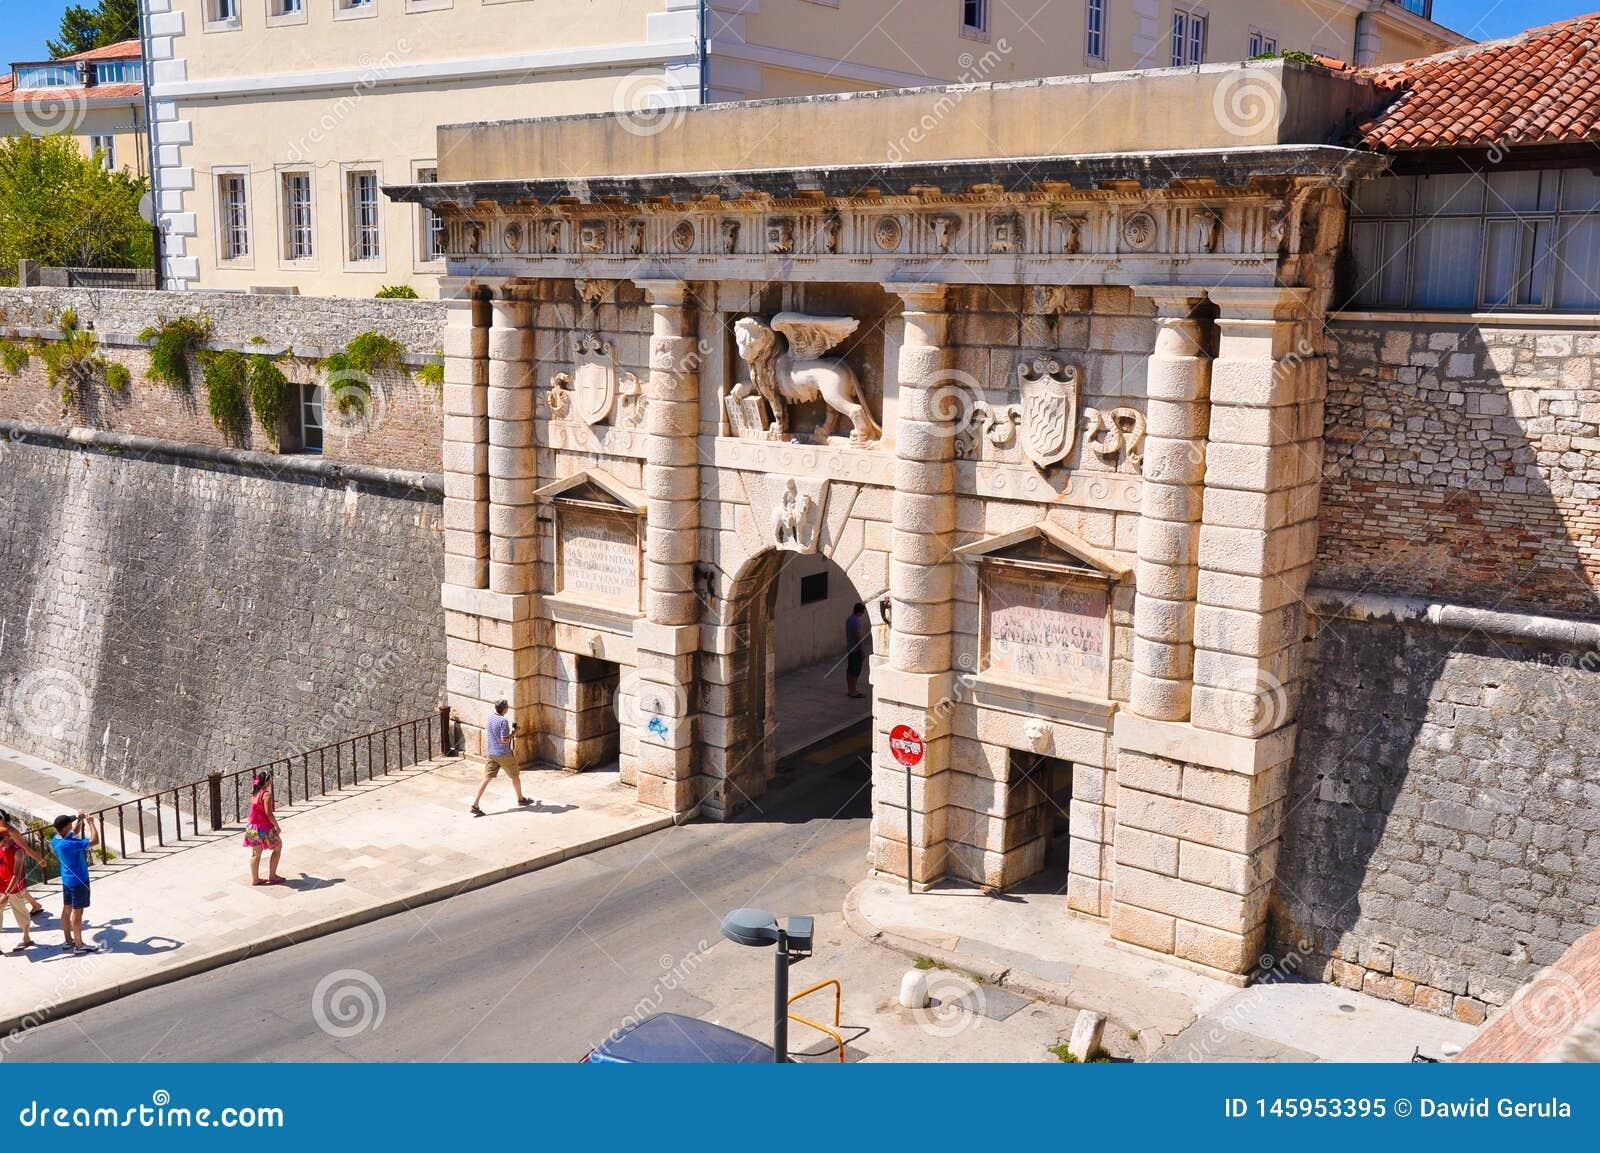 August 21, 2012. Croatia, Zadar: The Landward gate with the Lion of Saint Mark in Zadar